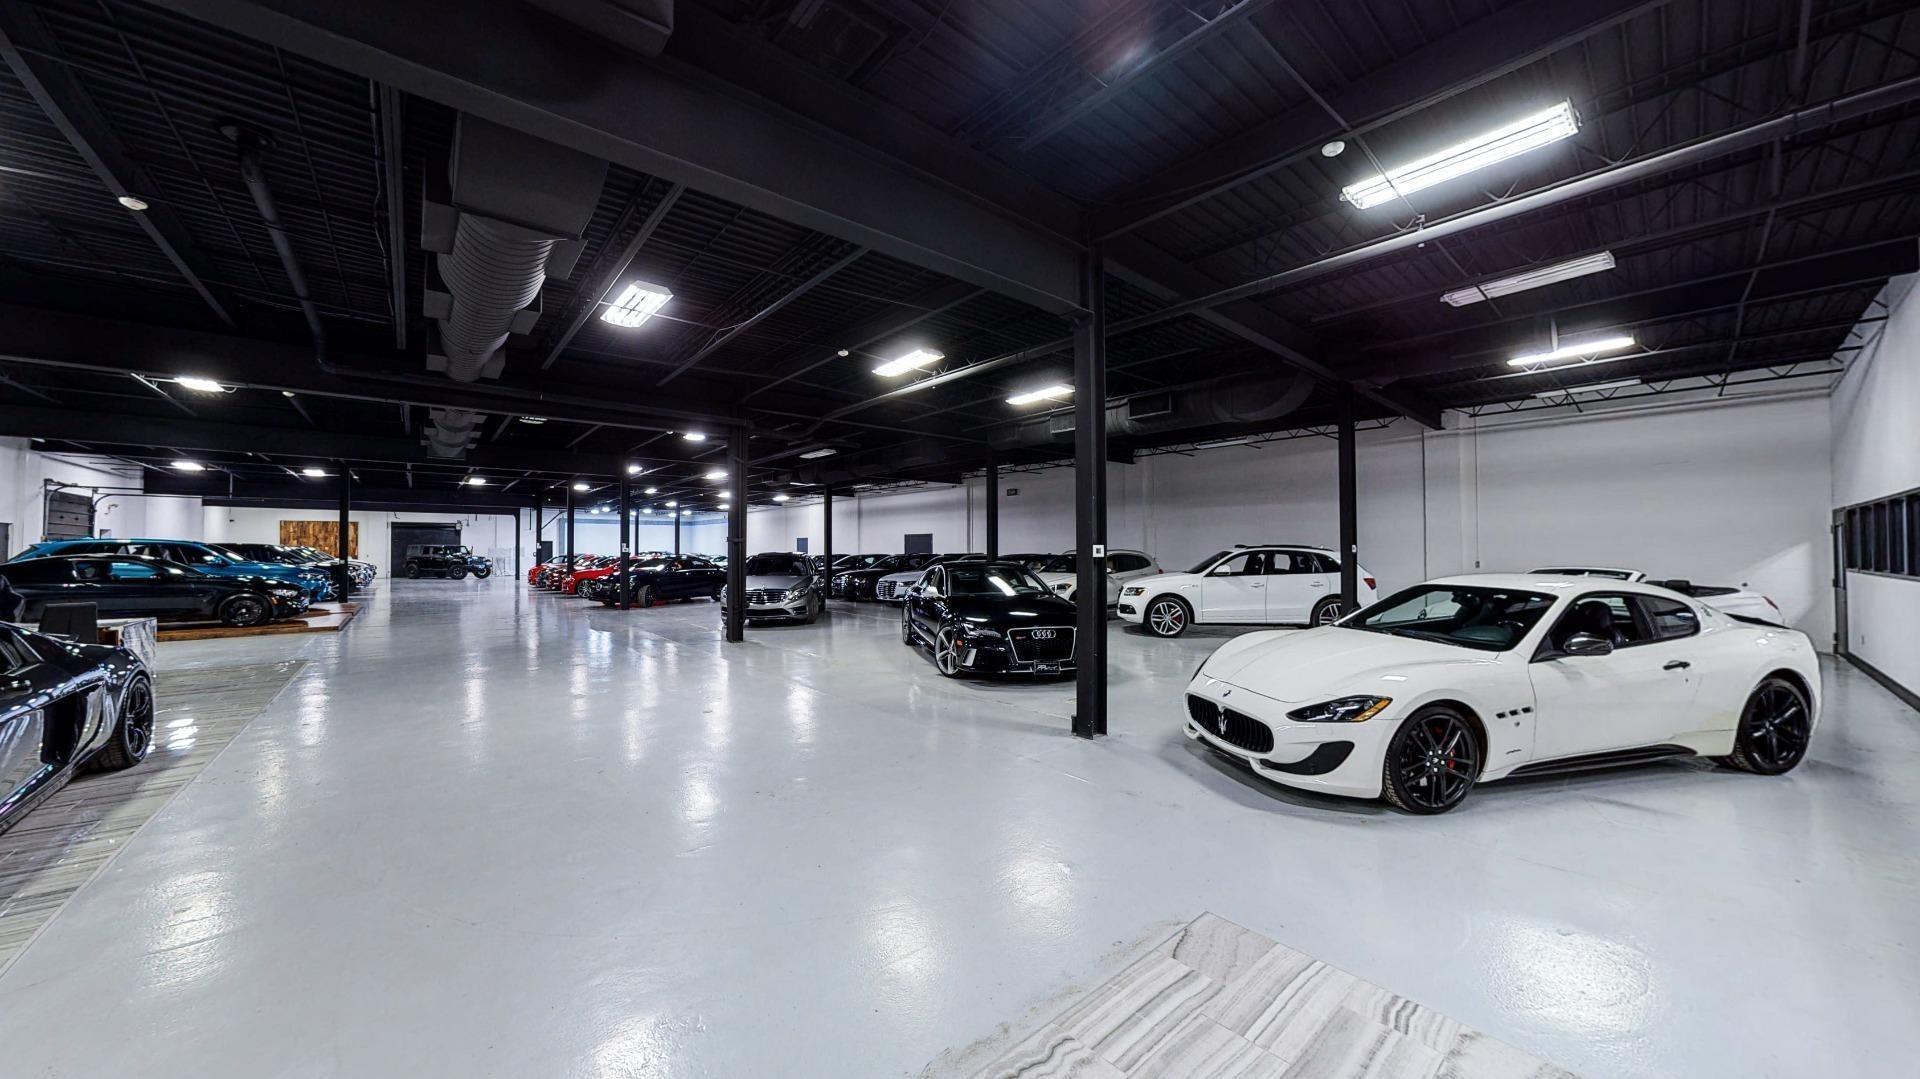 Used 2018 Audi Q5 2.0T quattro Premium Plus for sale $31,995 at Perfect Auto Collection in Akron OH 44310 3